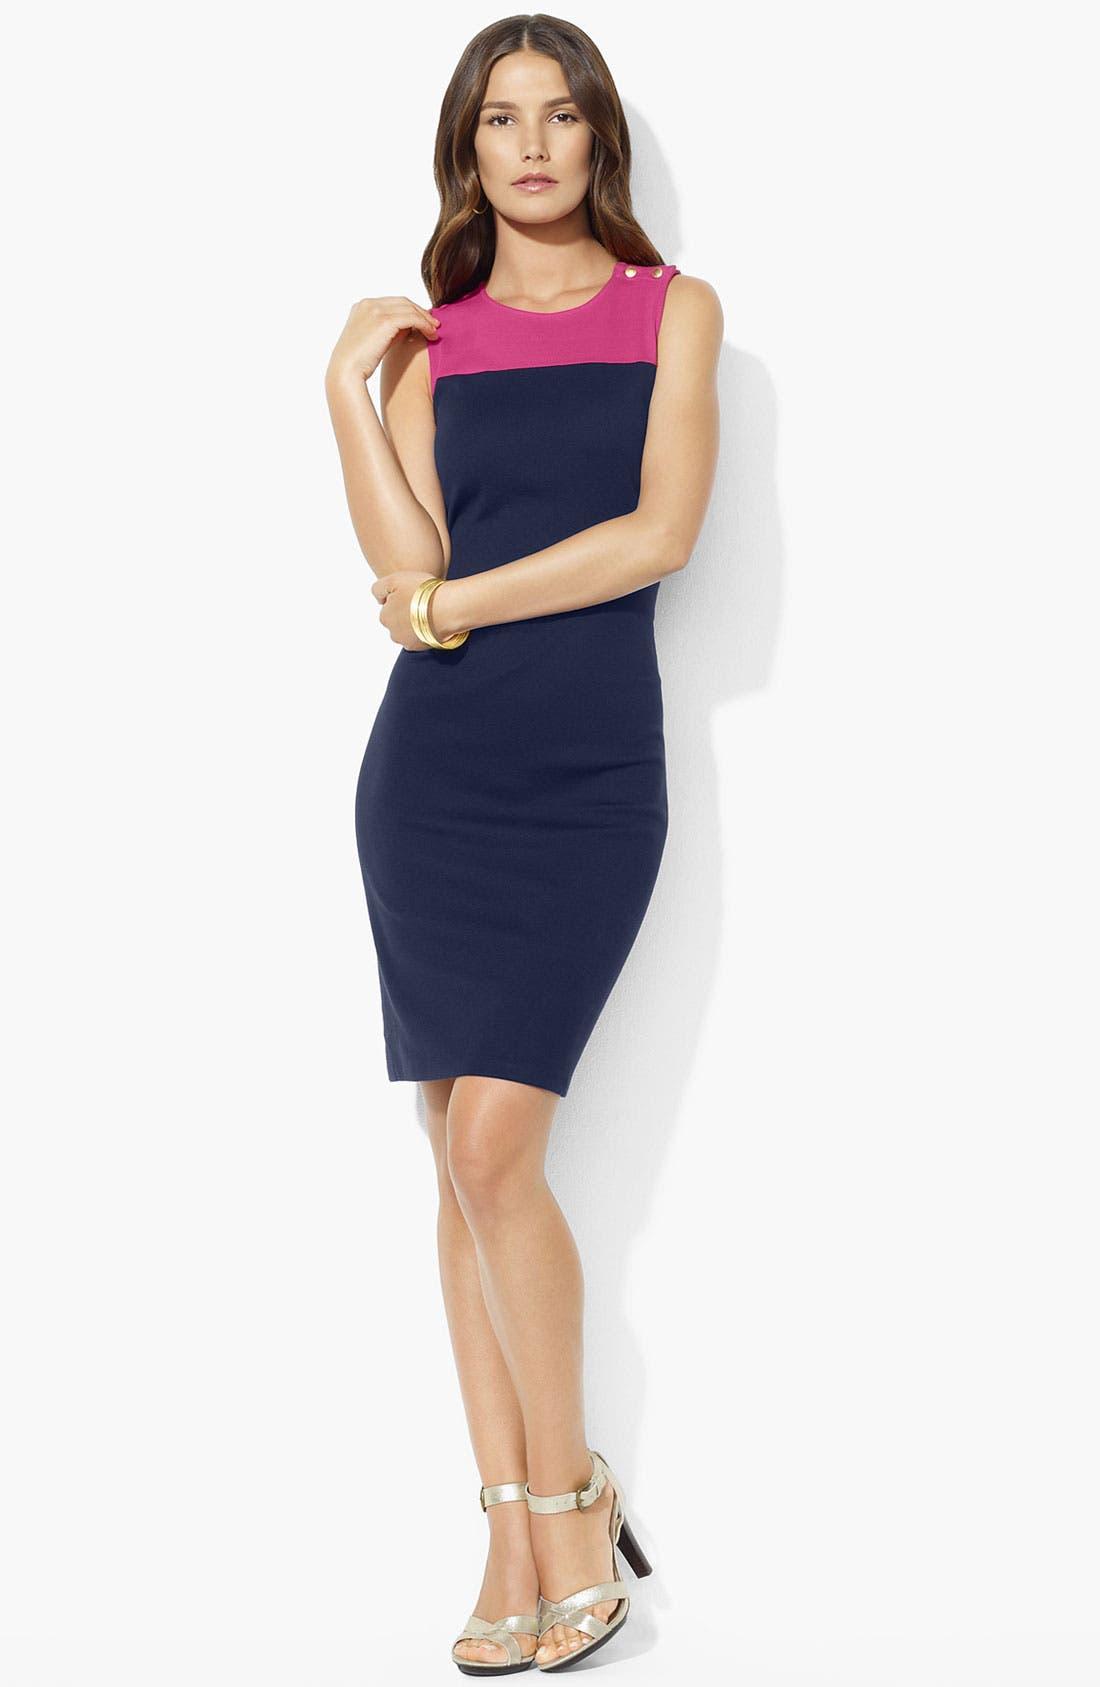 Alternate Image 1 Selected - Lauren Ralph Lauren Colorblock Sheath Dress (Petite)